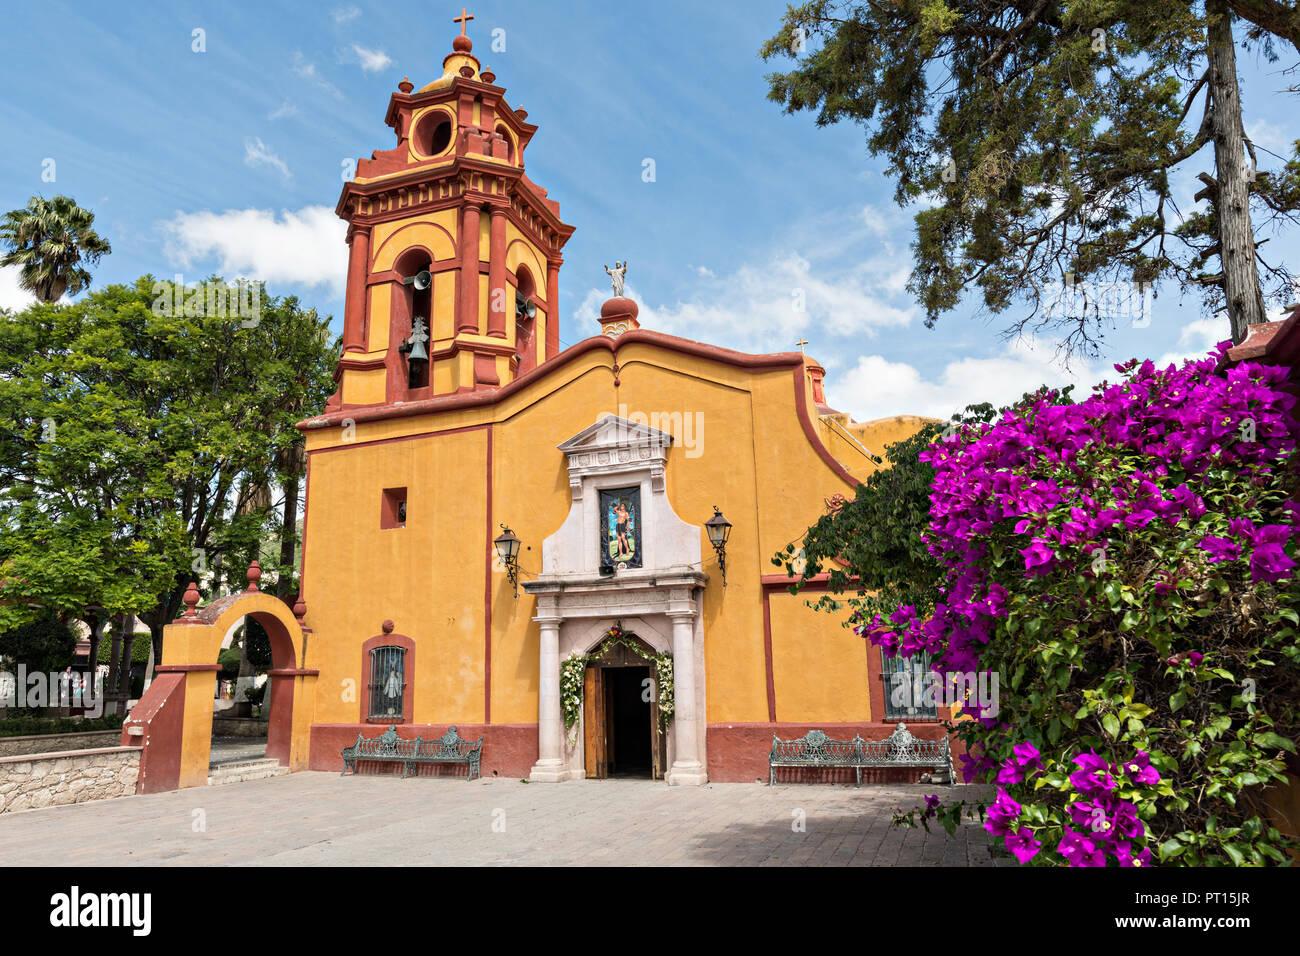 The Parroquia San Sebastian Church With Flowering Bougainvillea In